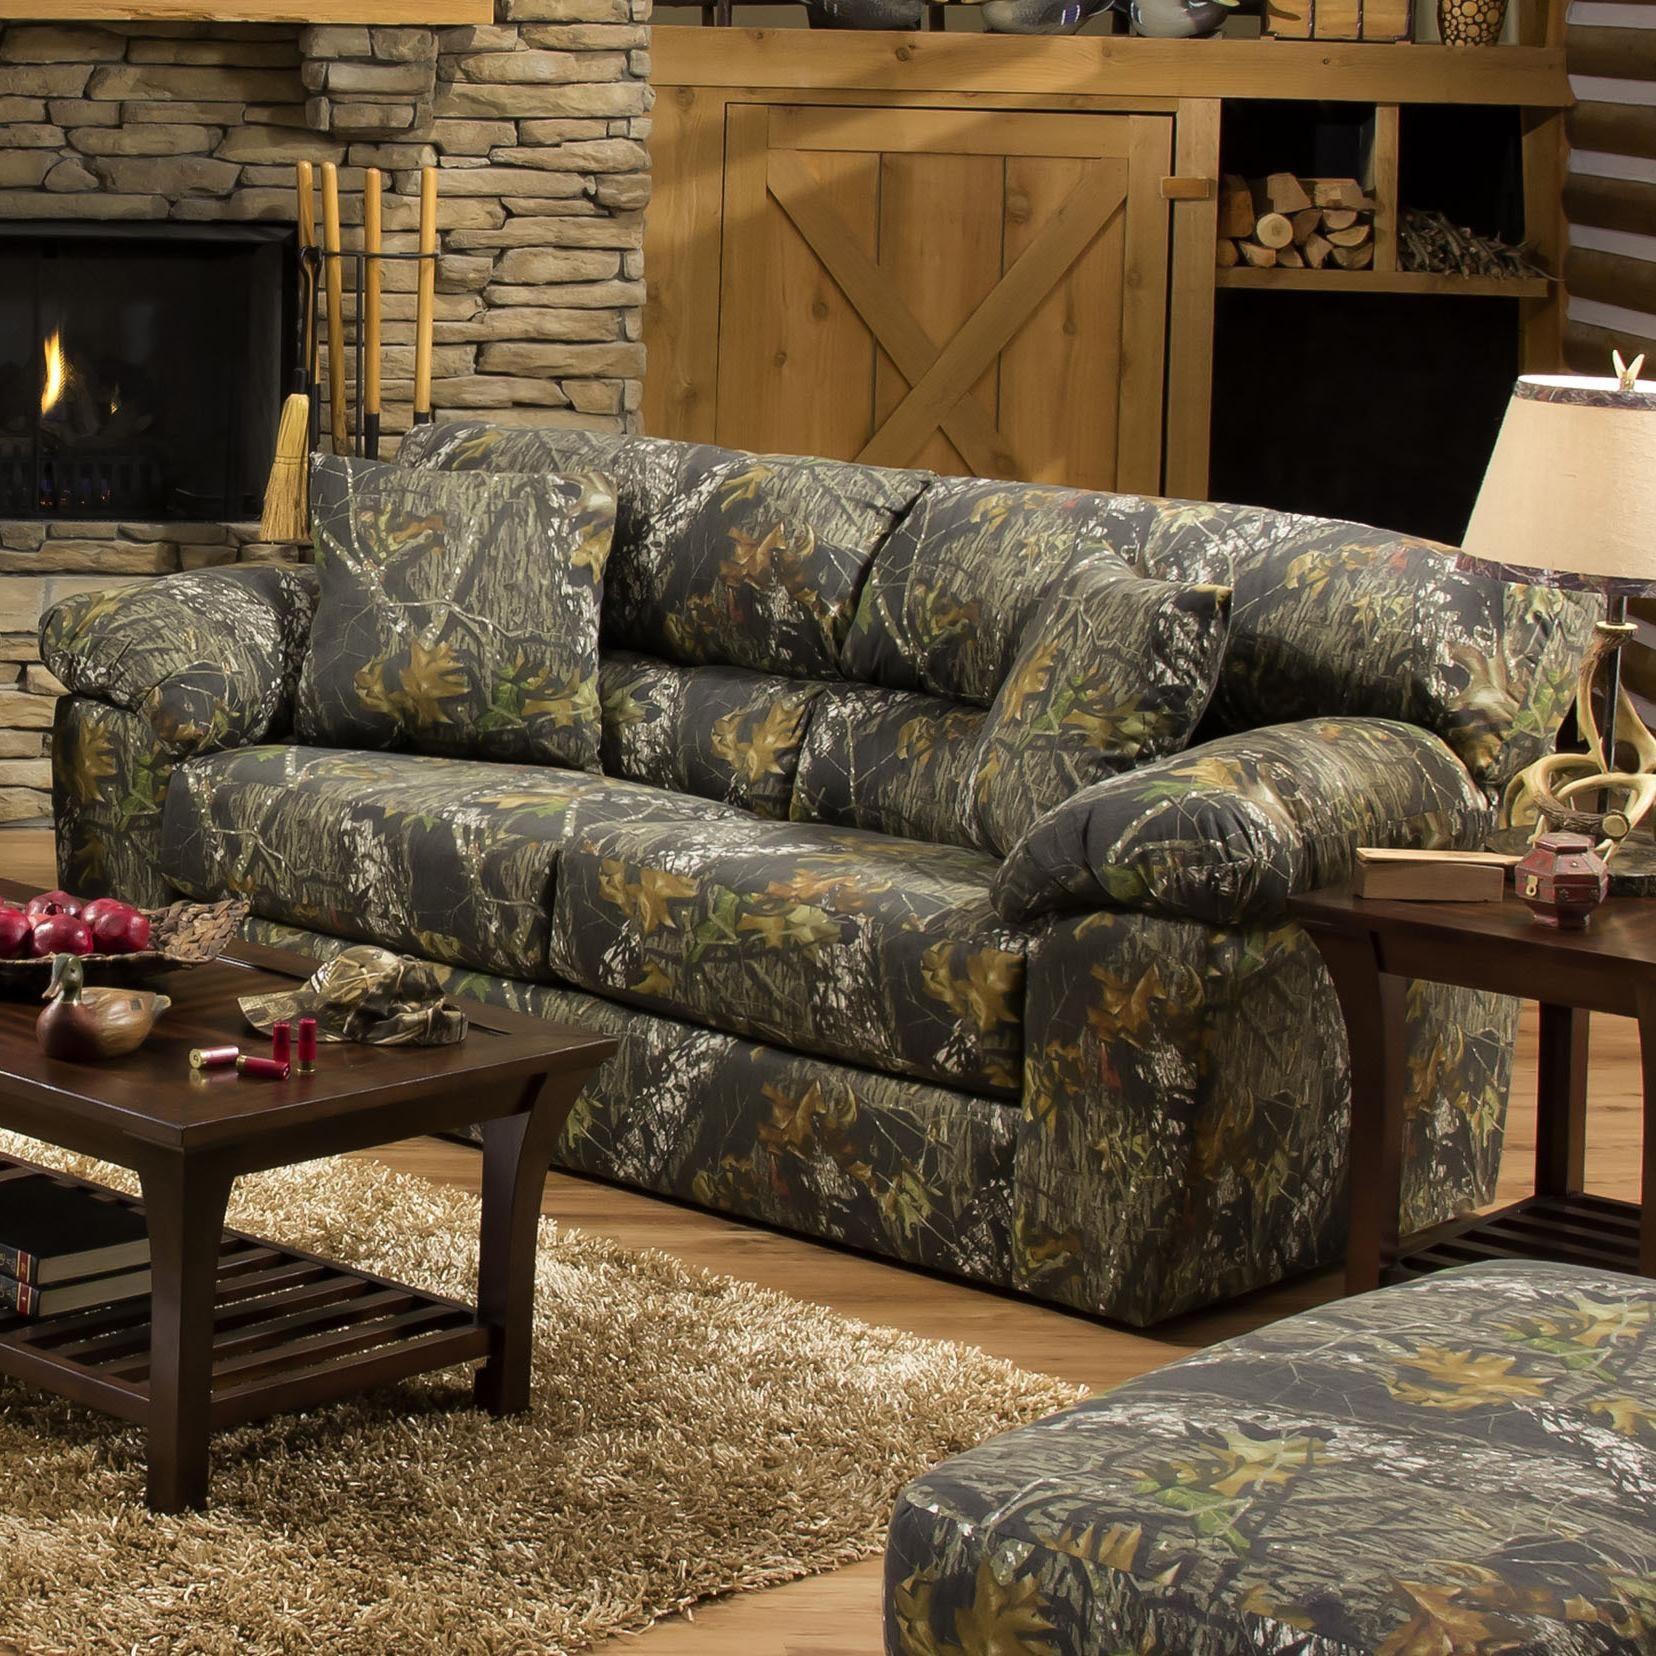 Jackson Furniture Big Game Camouflage Two Seat Sleeper Sofa